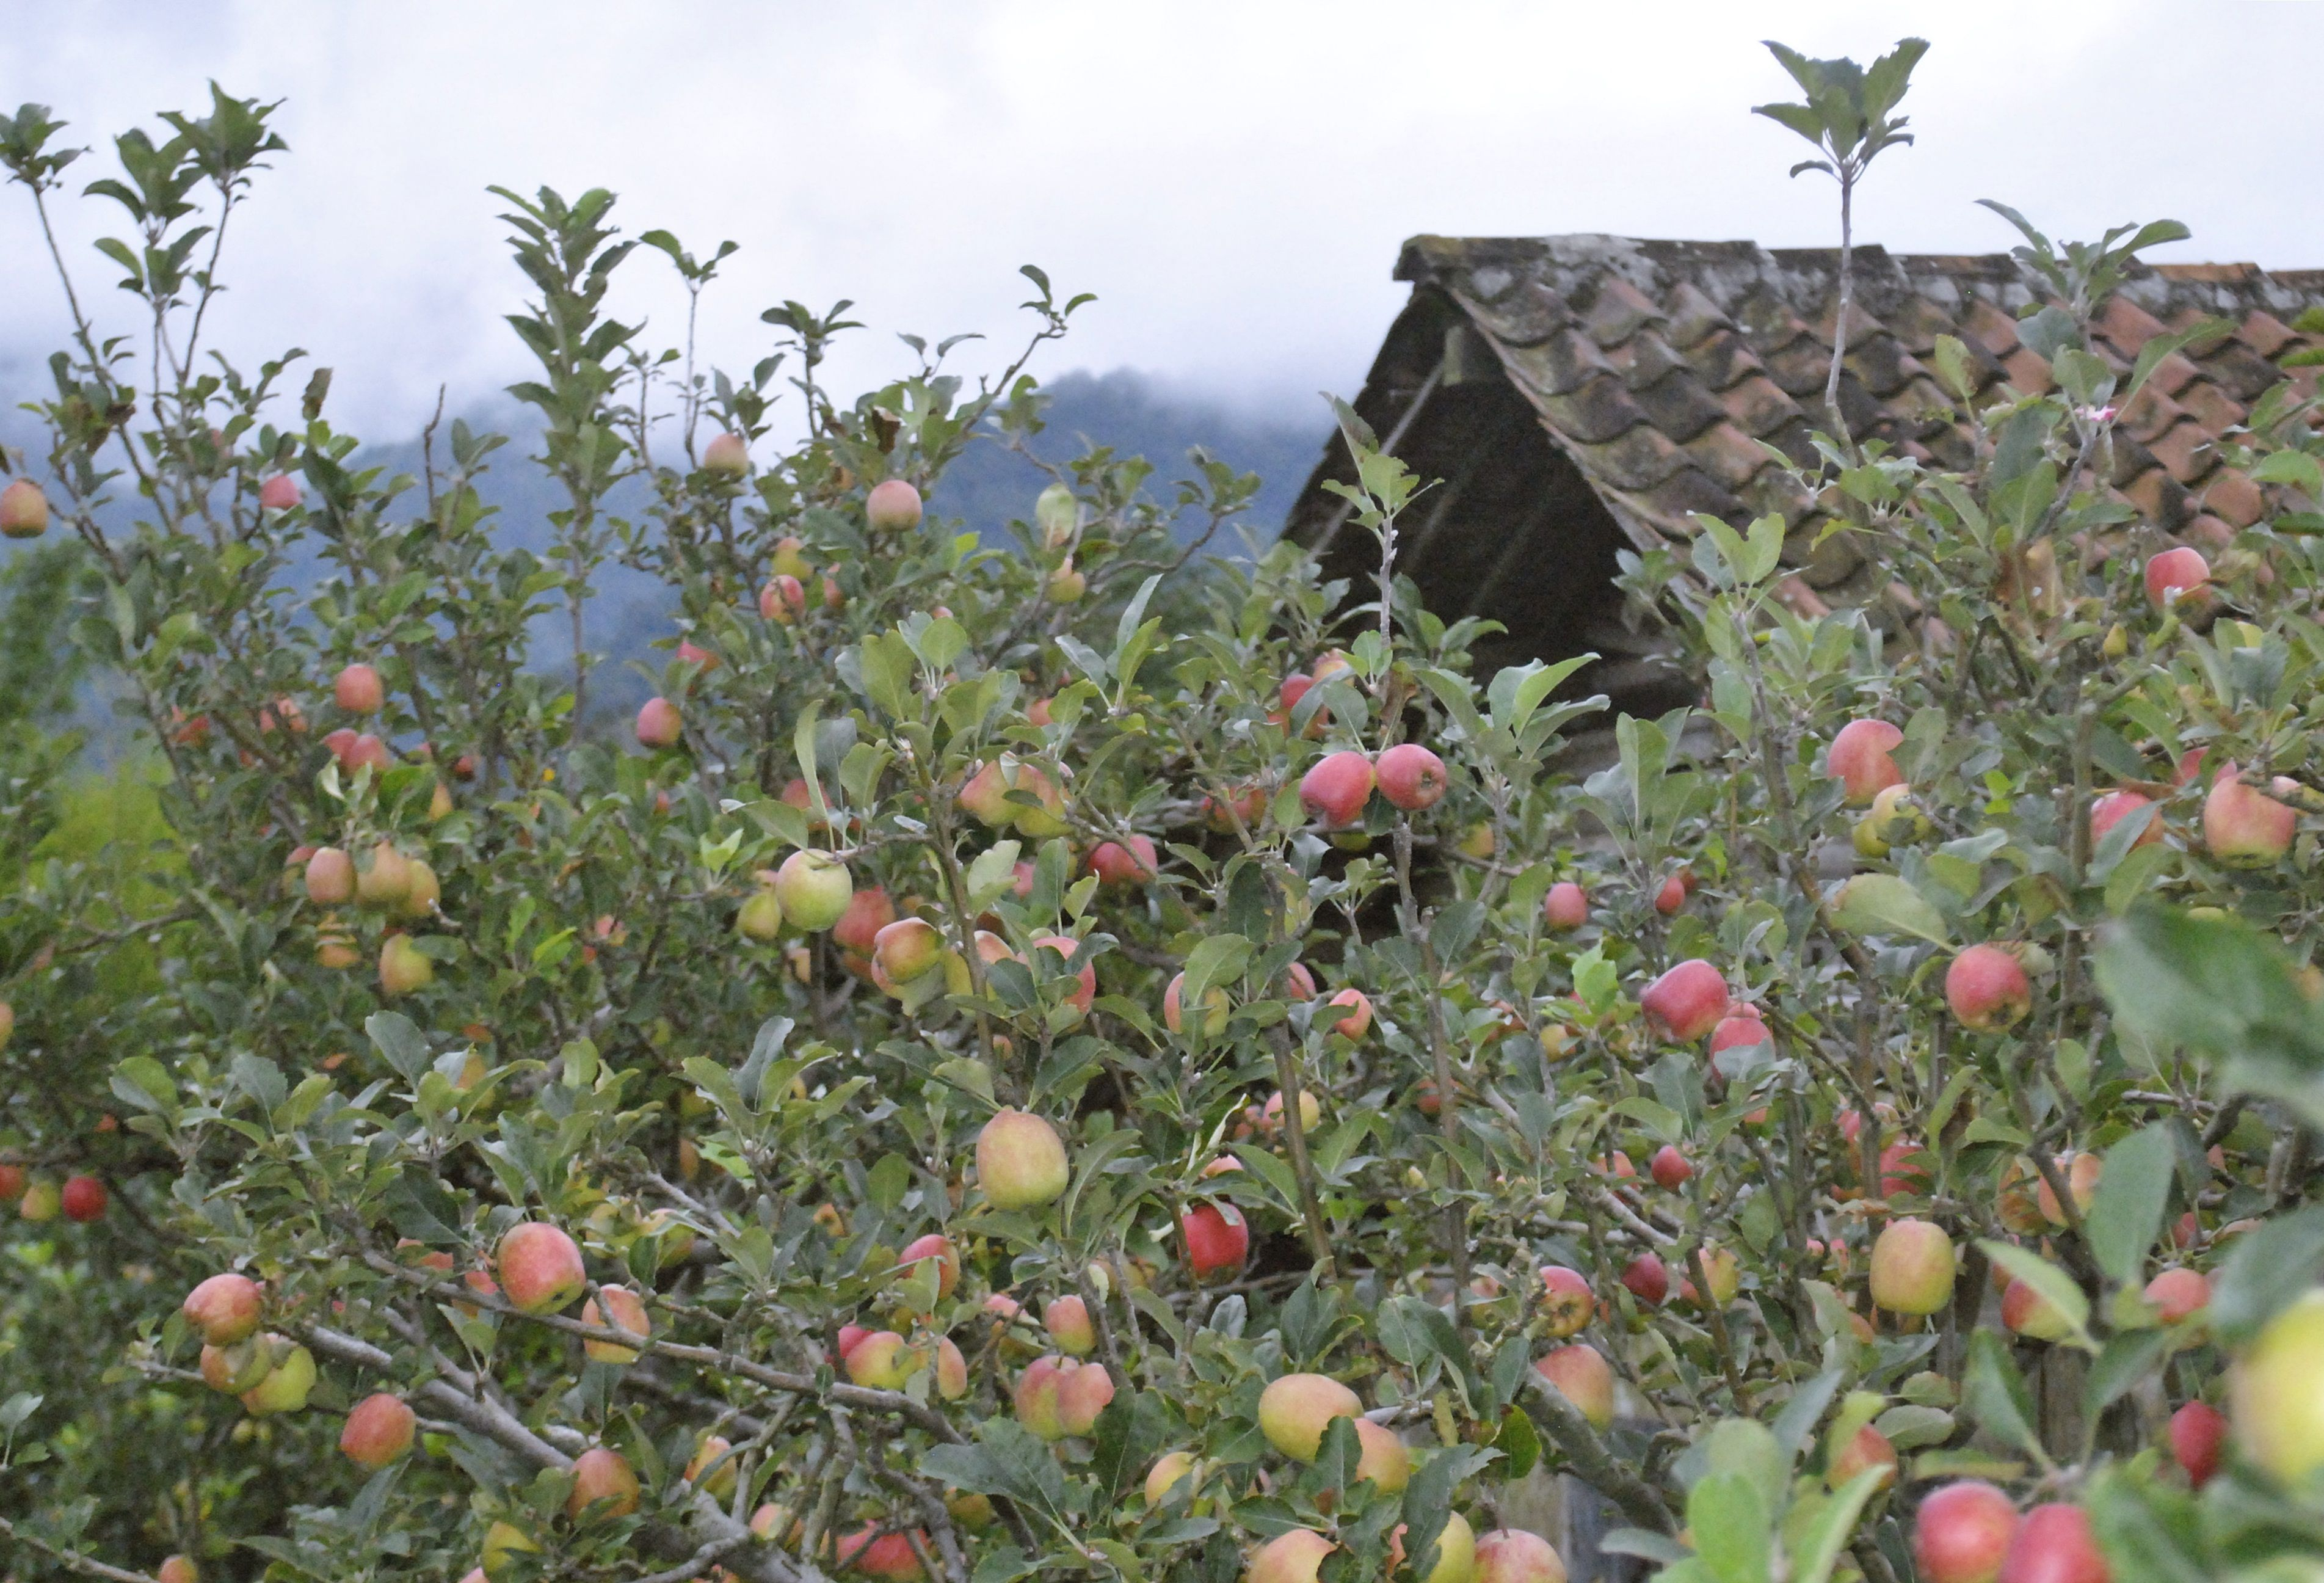 Wisata Kebun Apel Malang